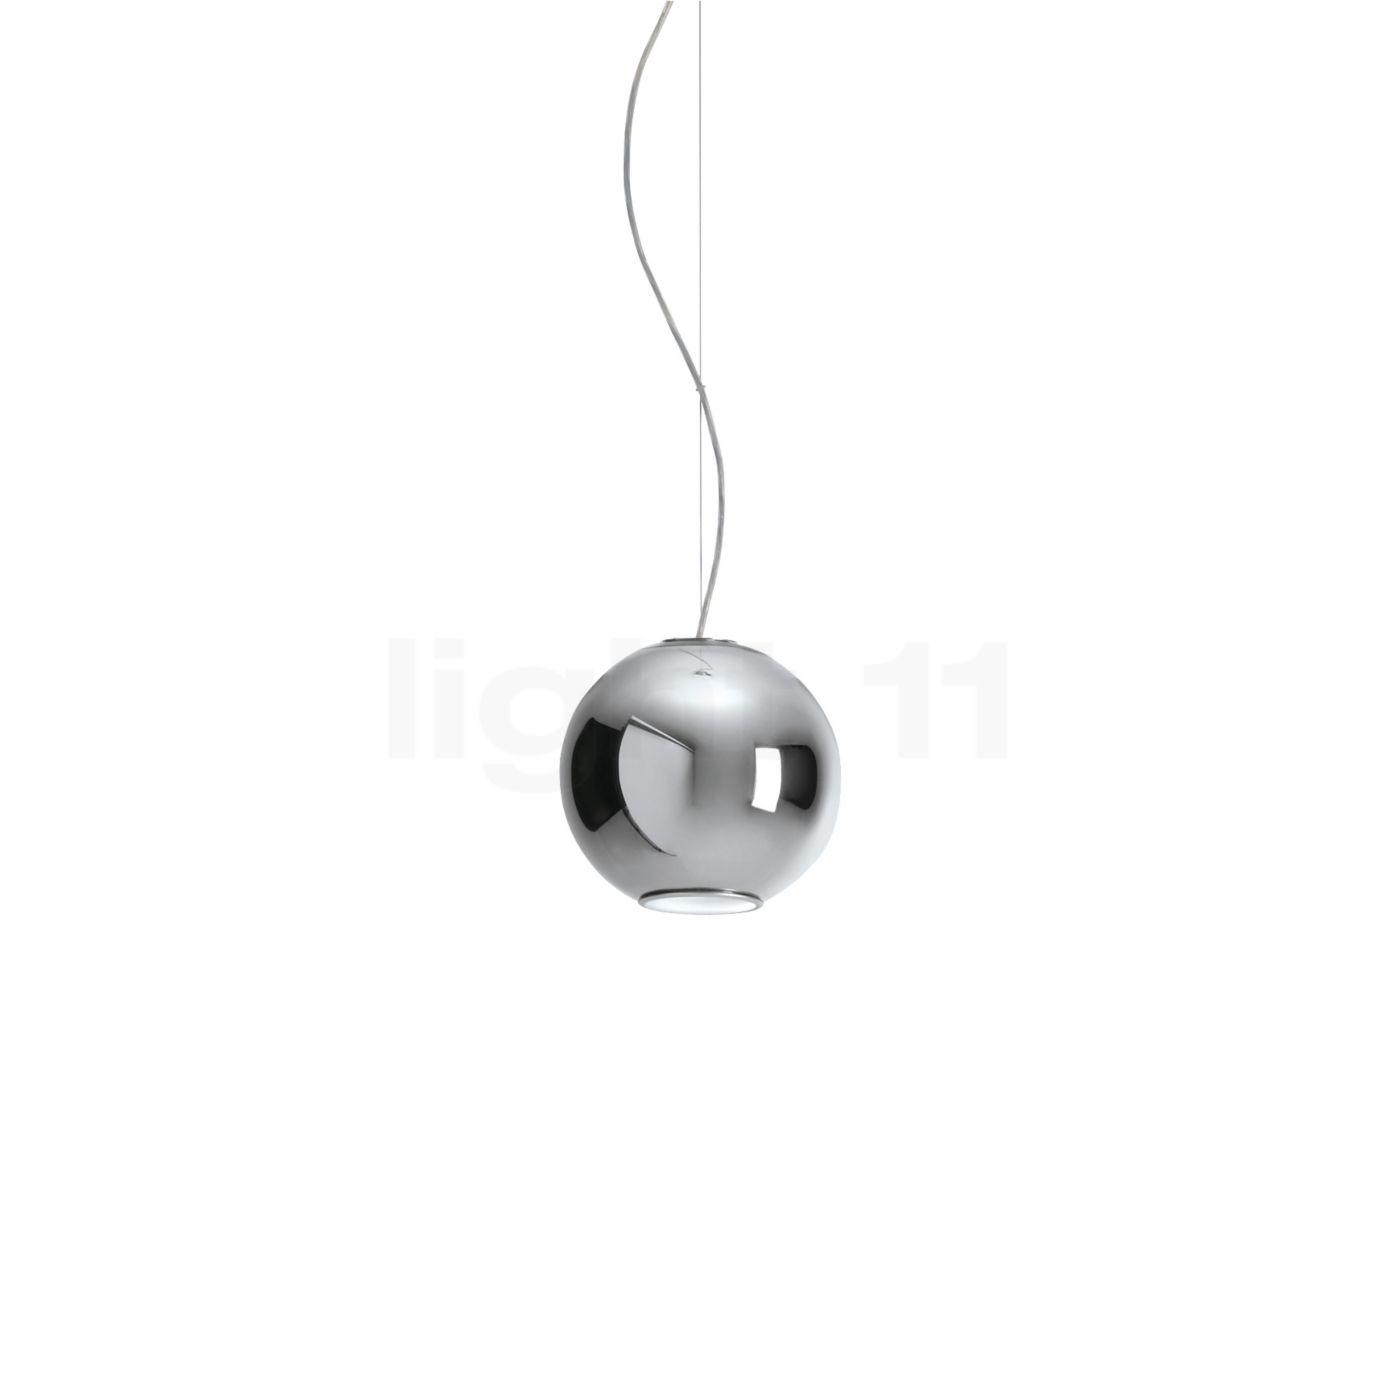 Fontana arte globo di luce sospensione pendant lights aloadofball Gallery